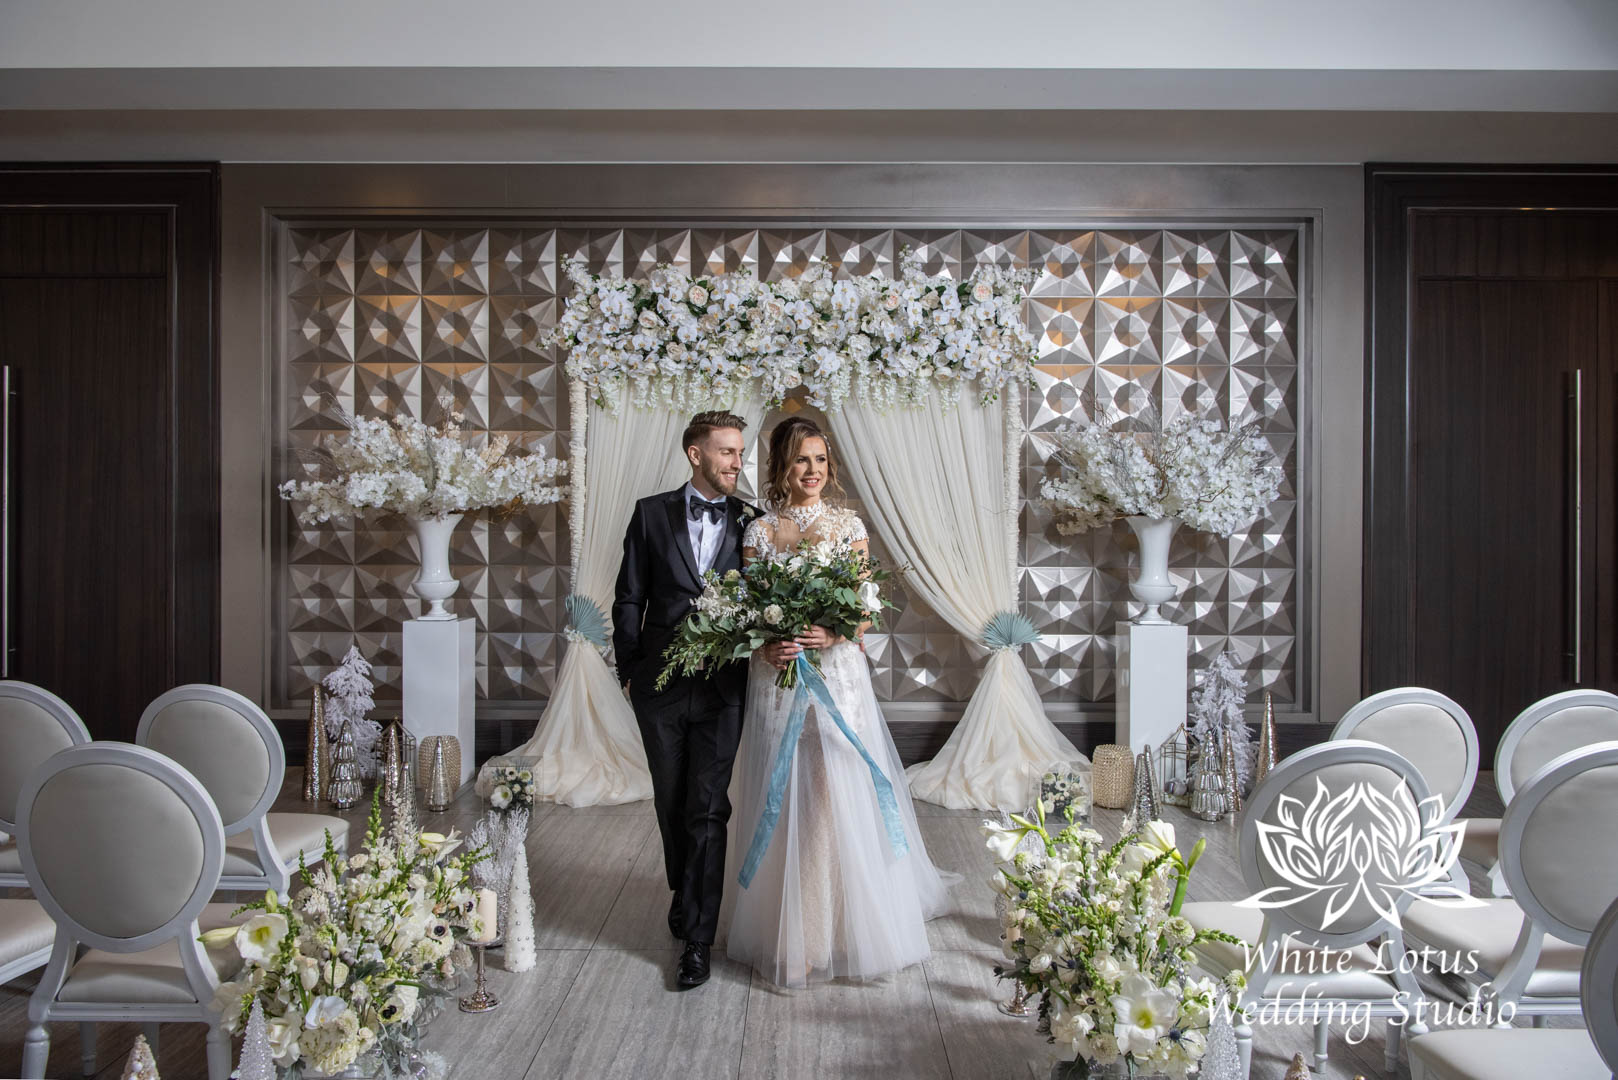 047- GLAM WINTERLUXE WEDDING INSPIRATION